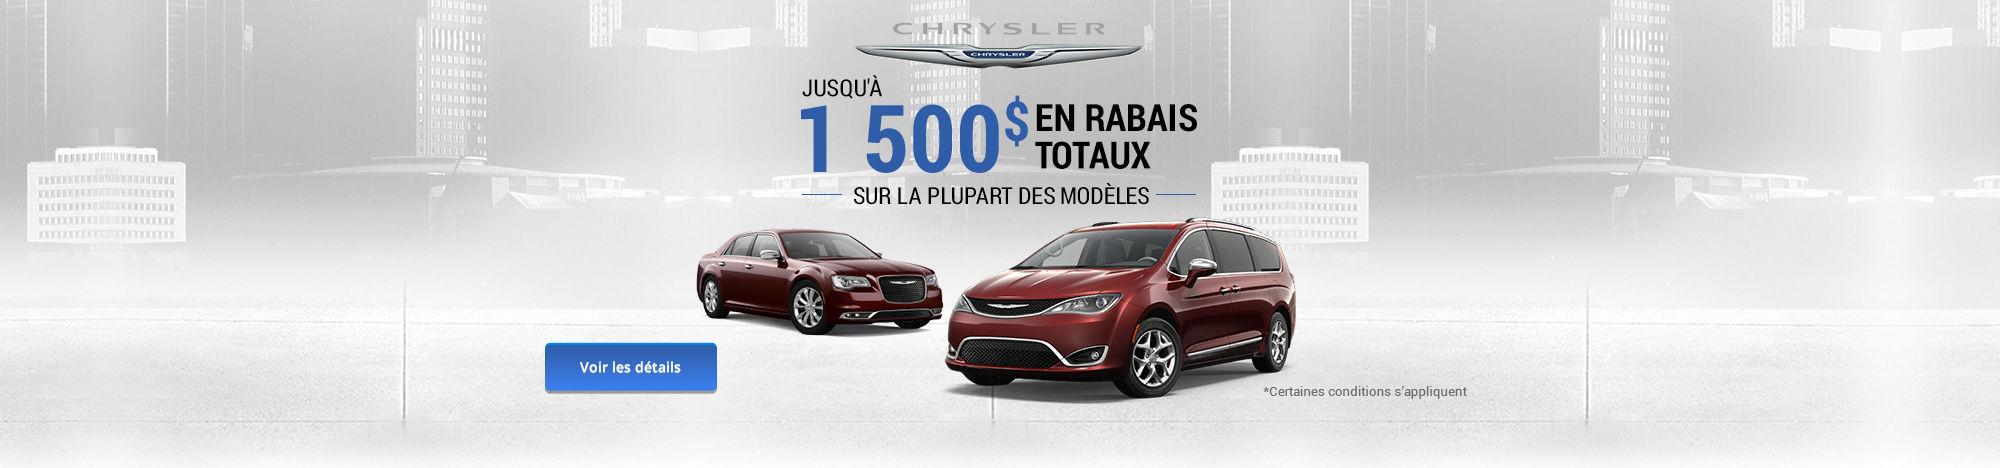 1 500$ en rabais totaux - Chrysler